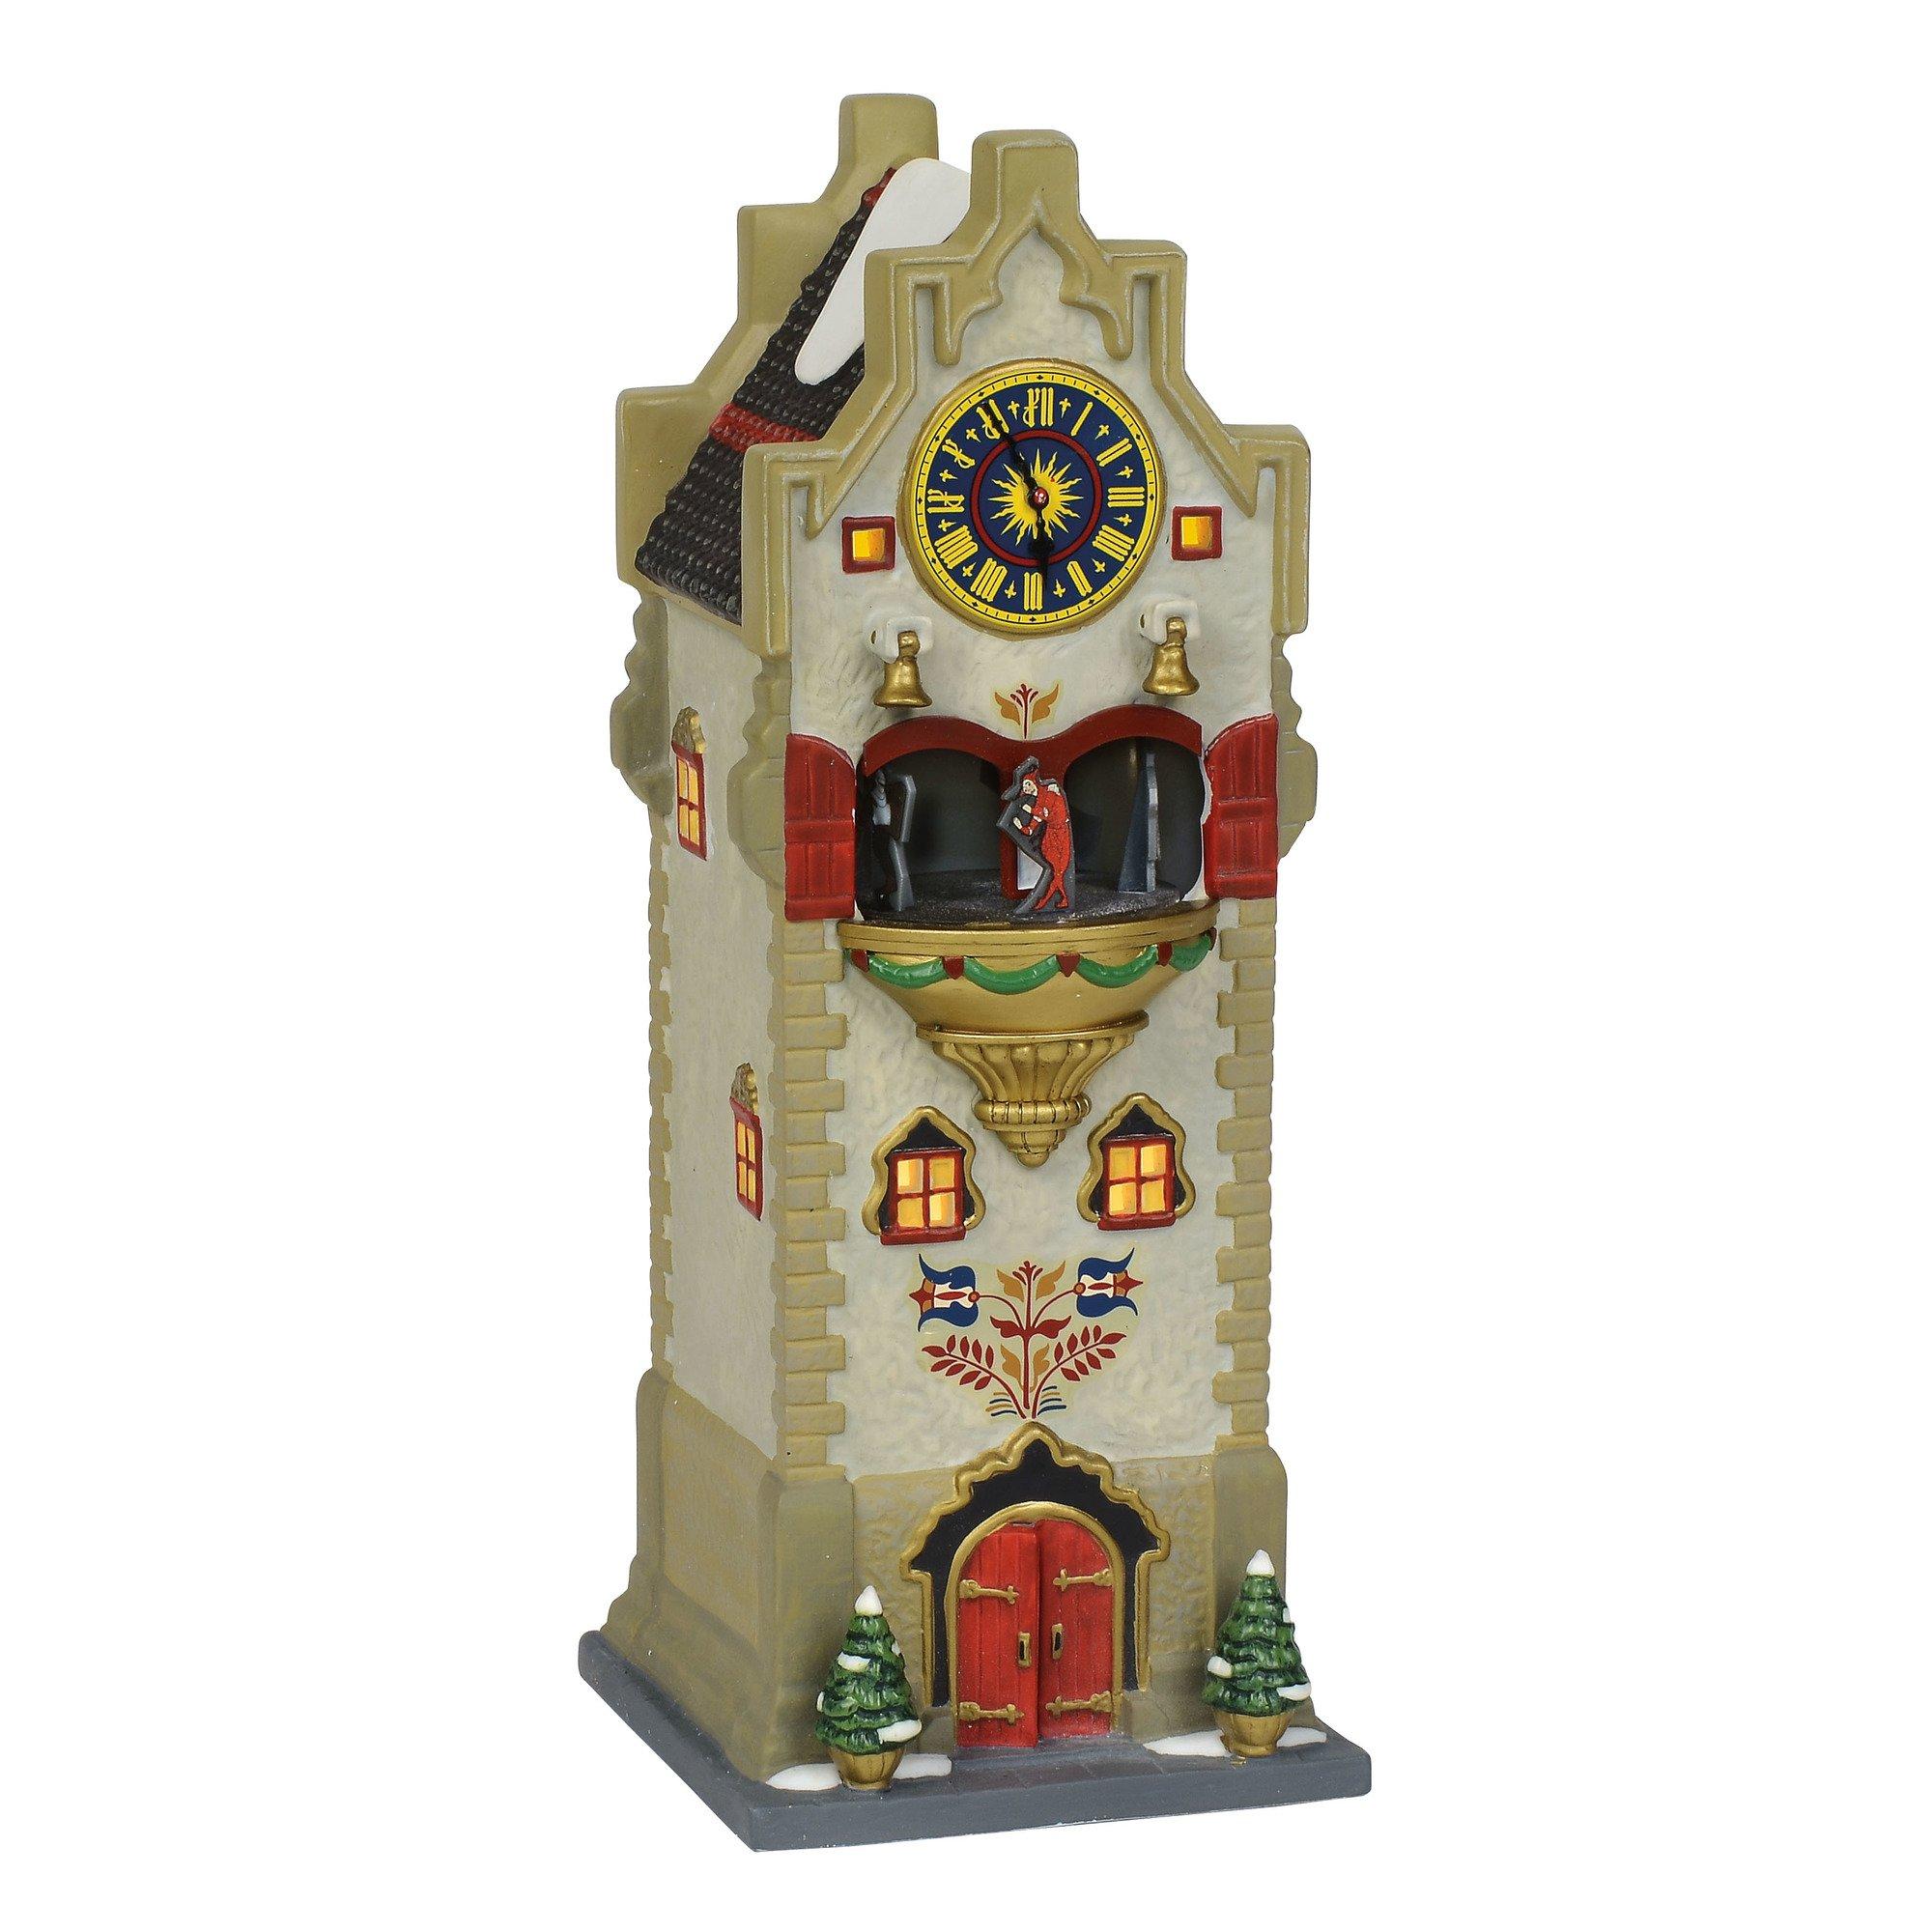 Department 56 Alpine Village Rhineland Glockenspiel Lit Animated Building, 10'', Multicolor by Department 56